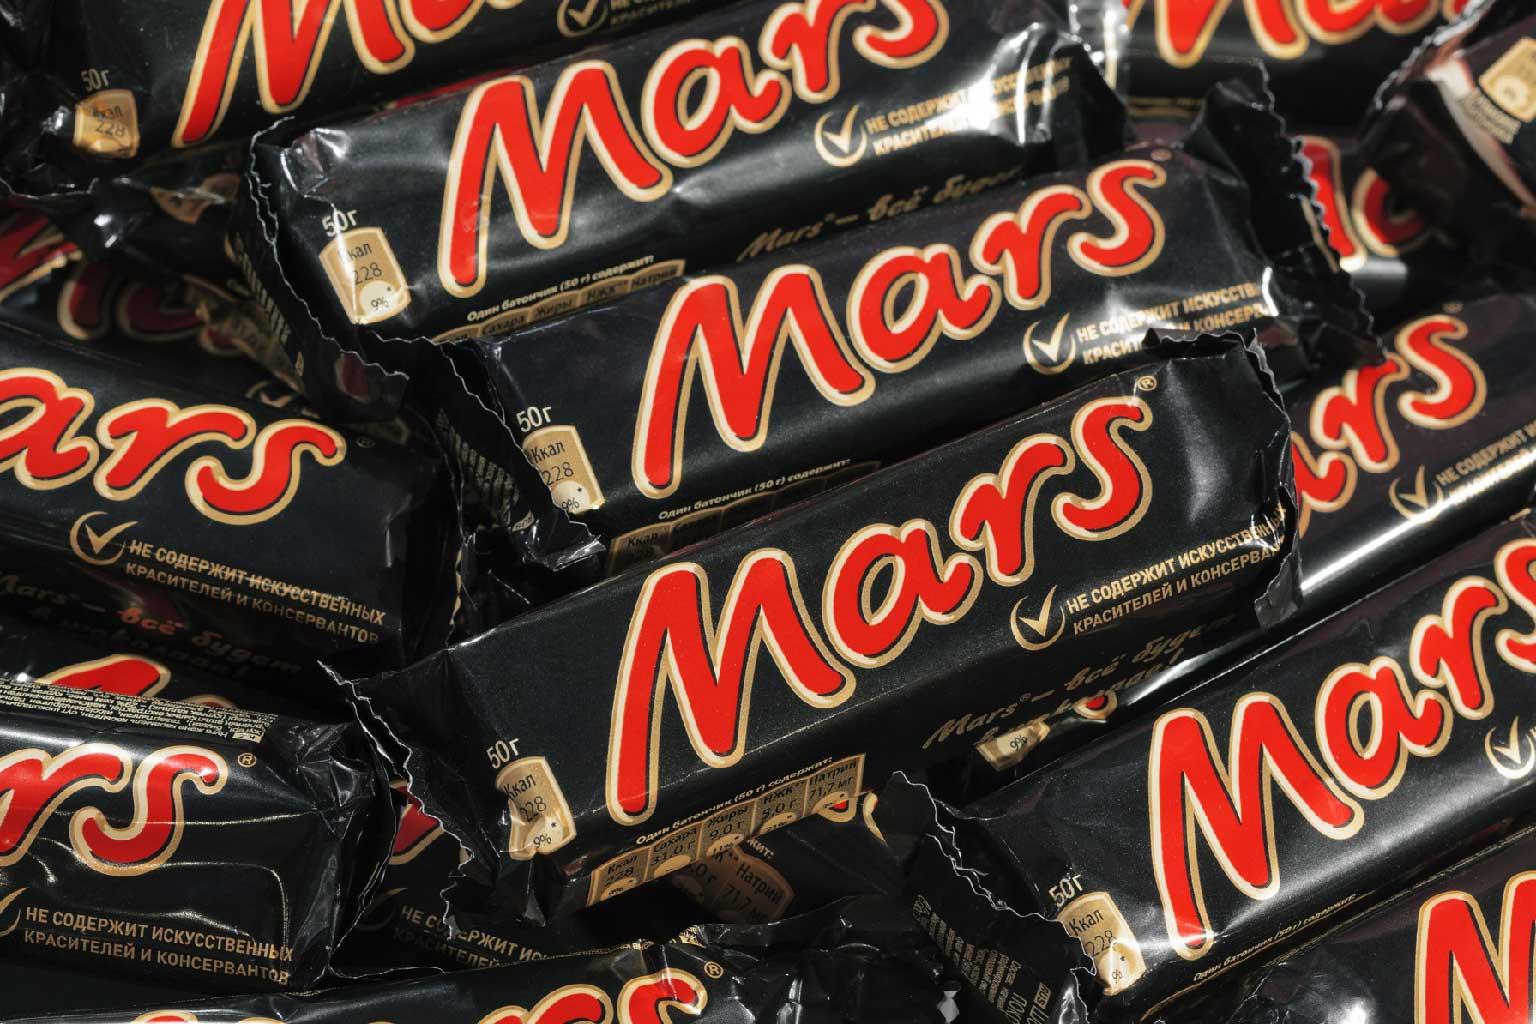 A pile of Mars bars